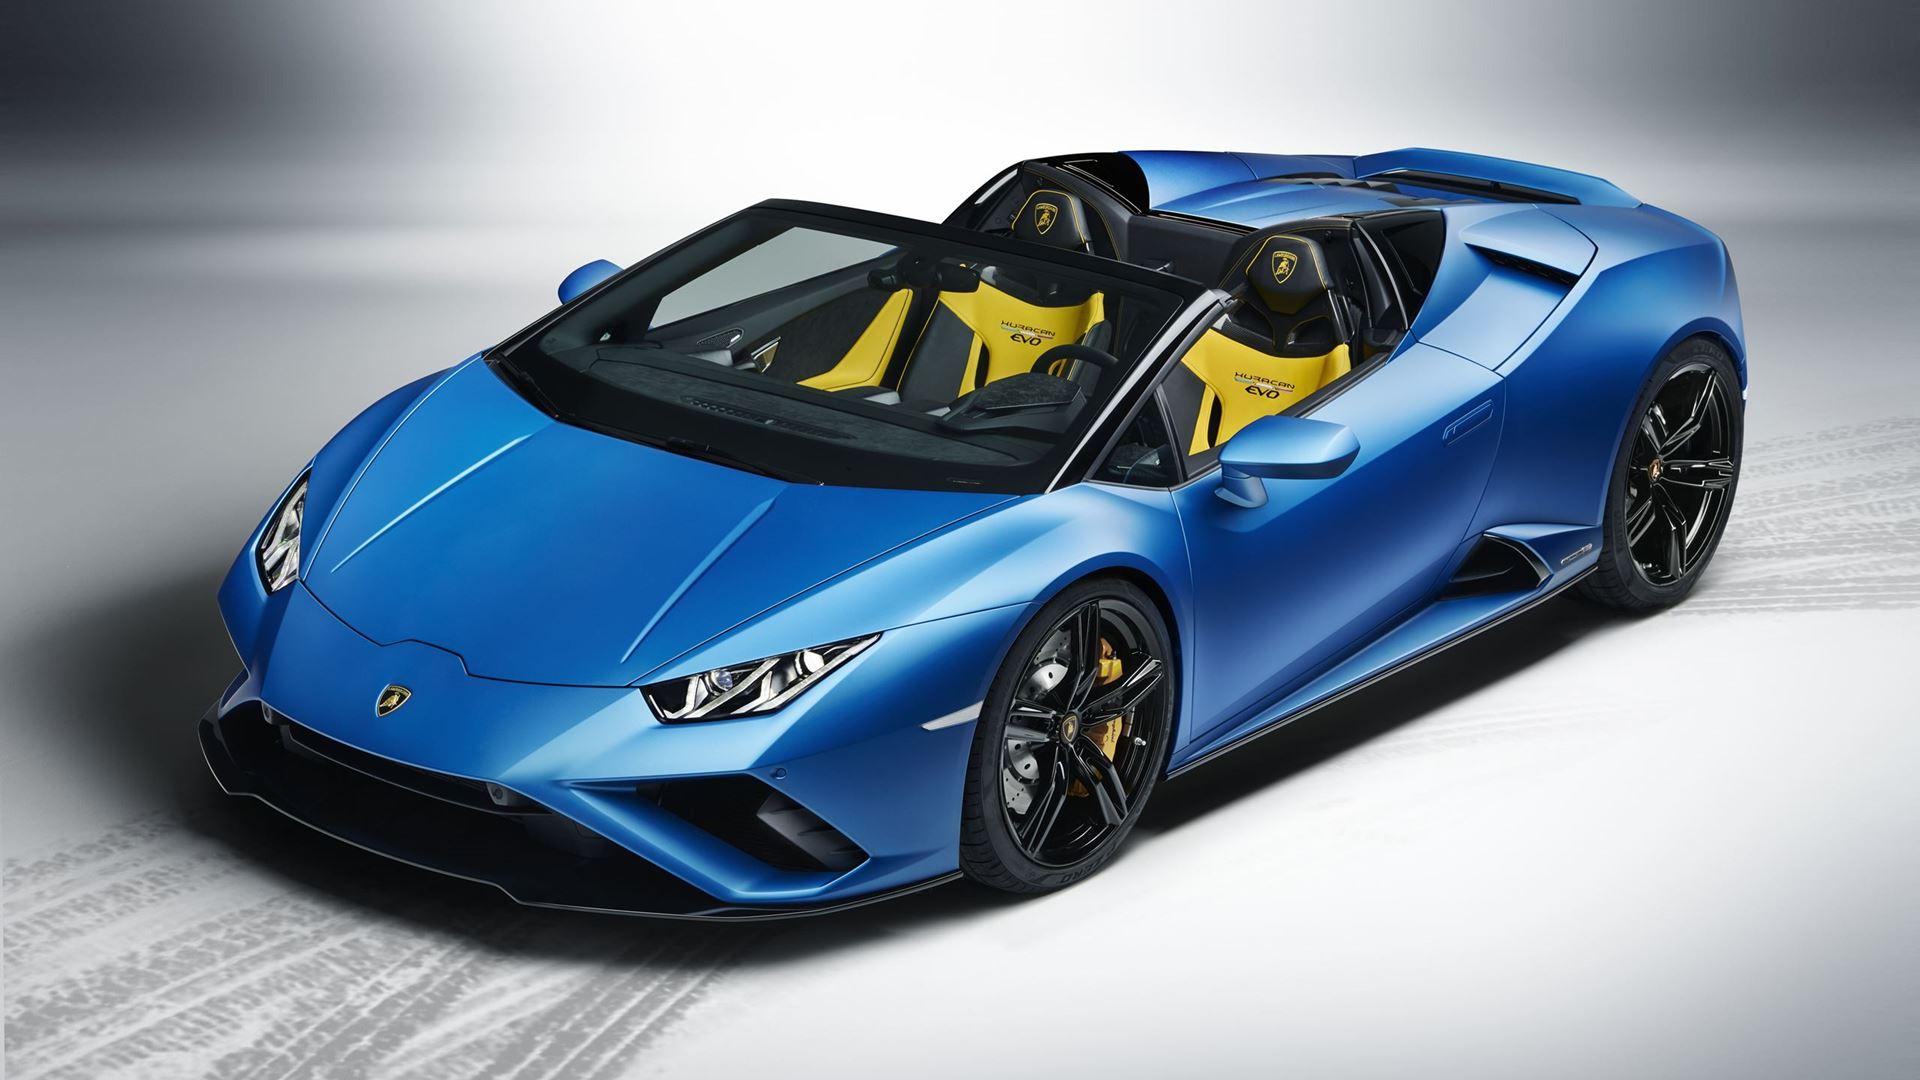 Automobili Lamborghini: sales soaring, record first quarter - Image 6